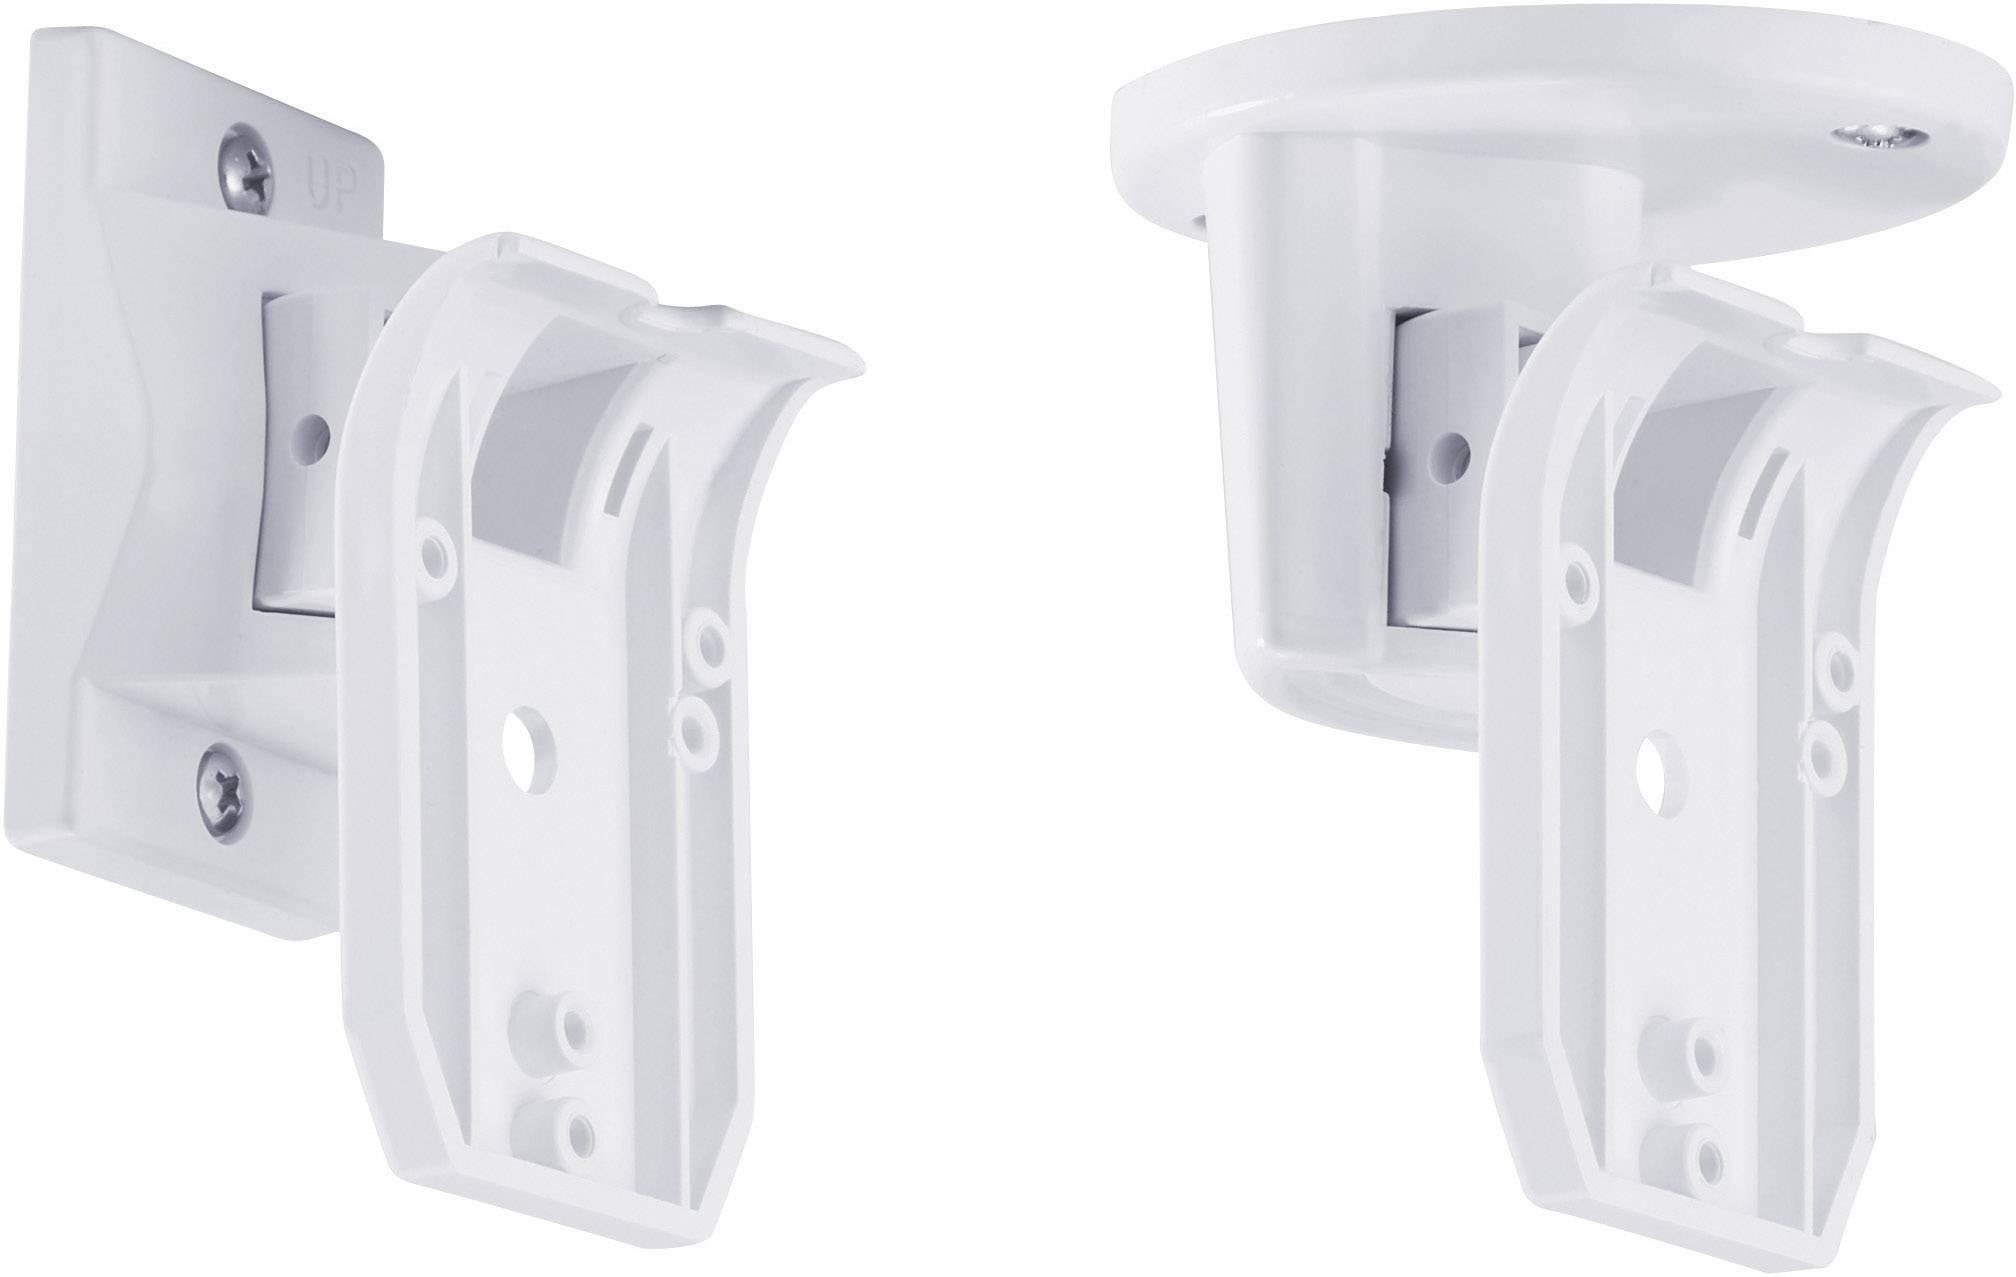 Držiak na stenu ABUS BW8060 na senzor pohybu BW8060